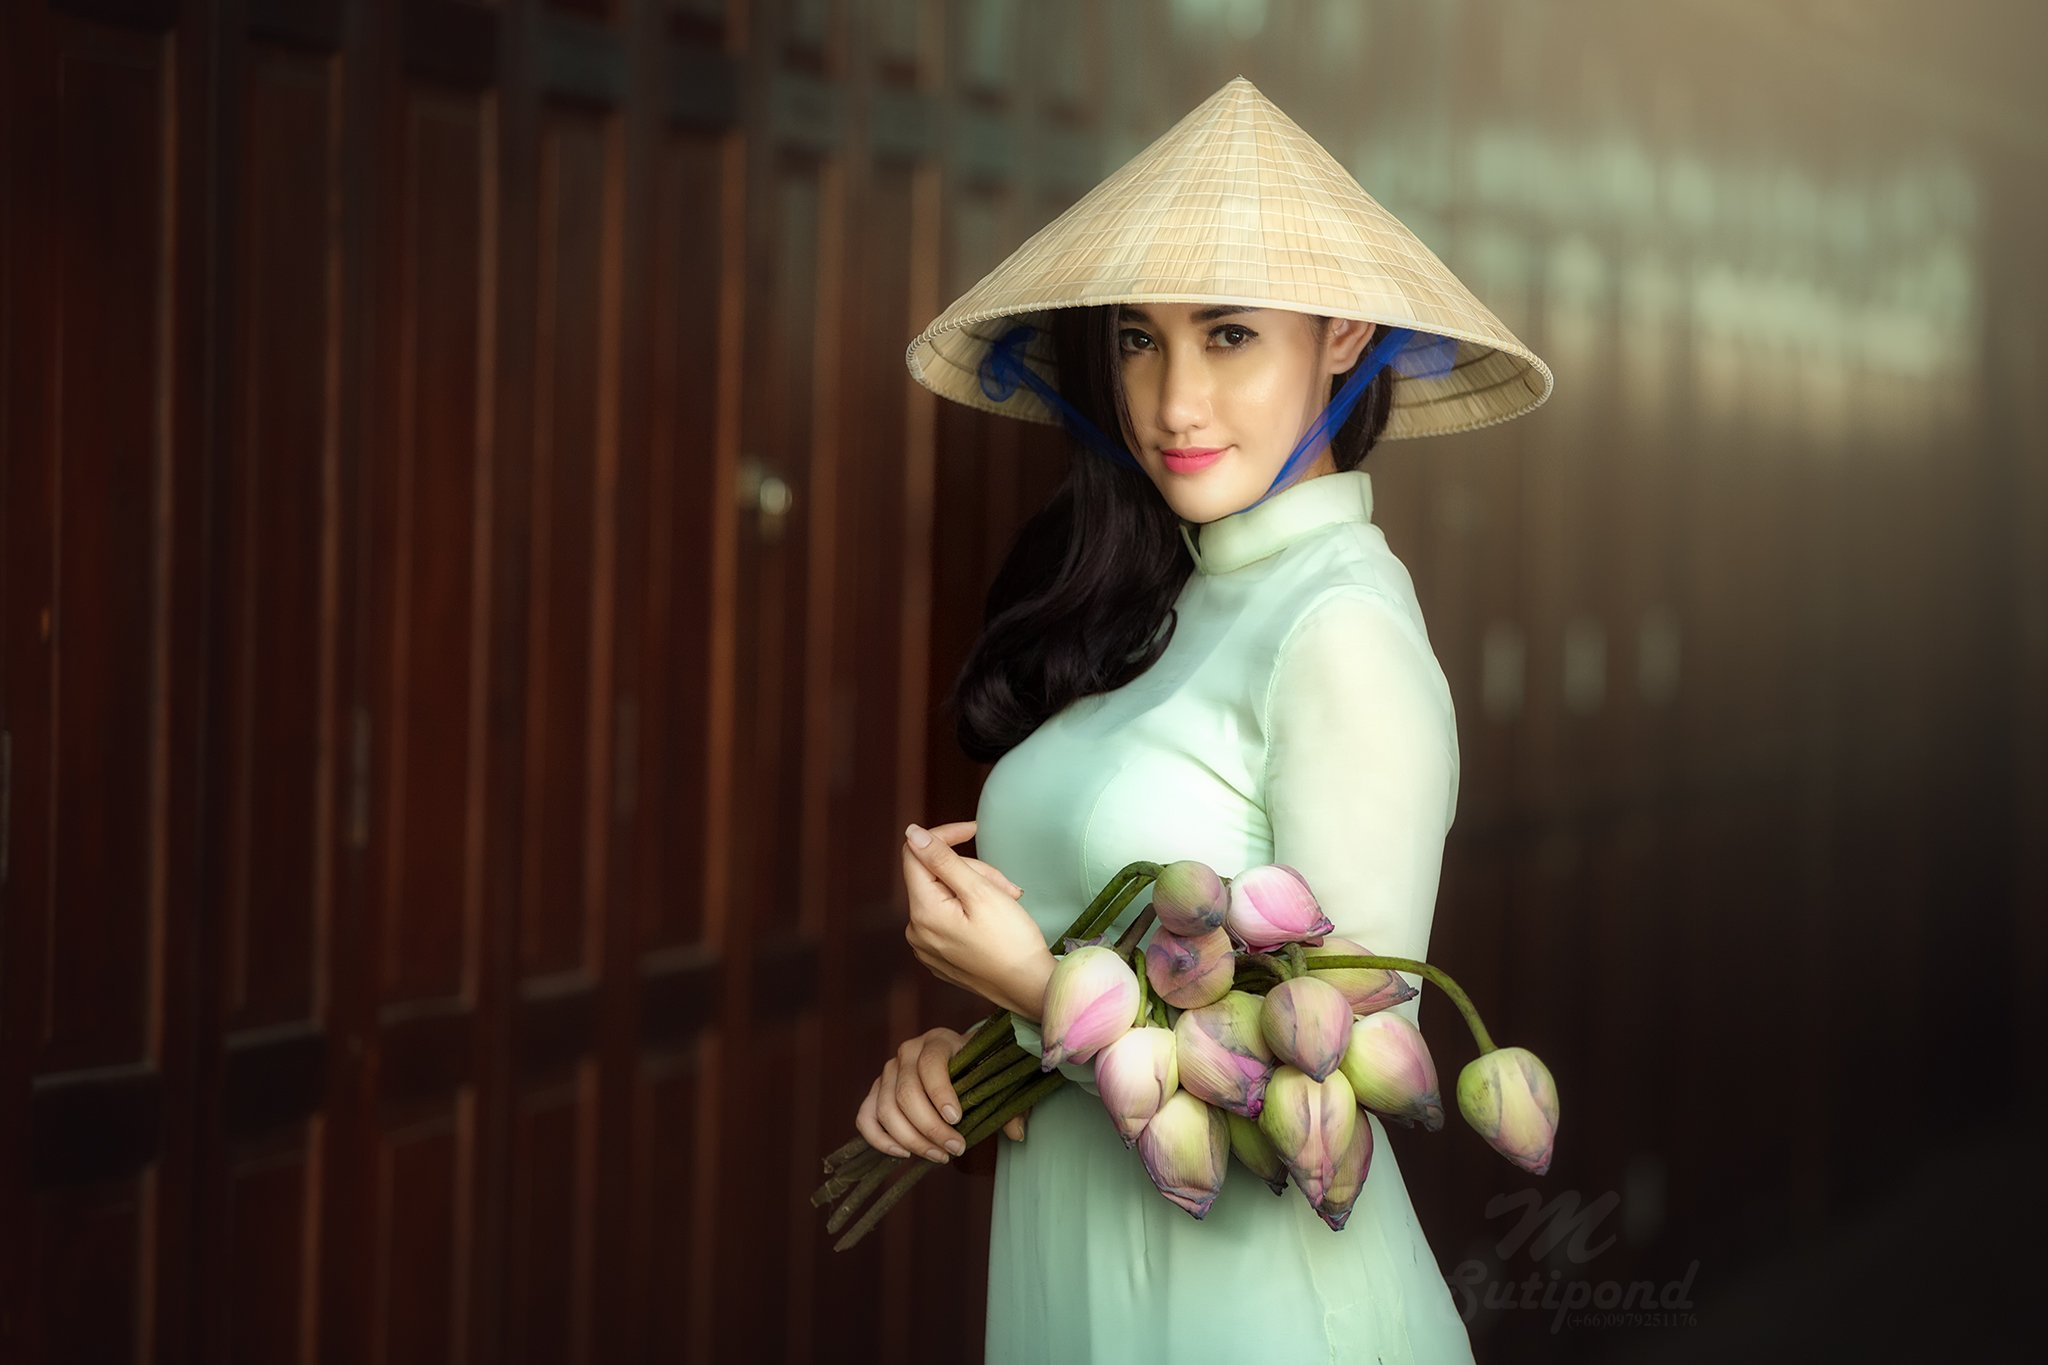 vietnam,portrait,women,asia women,smiling,, SUTIPORN SOMNAM